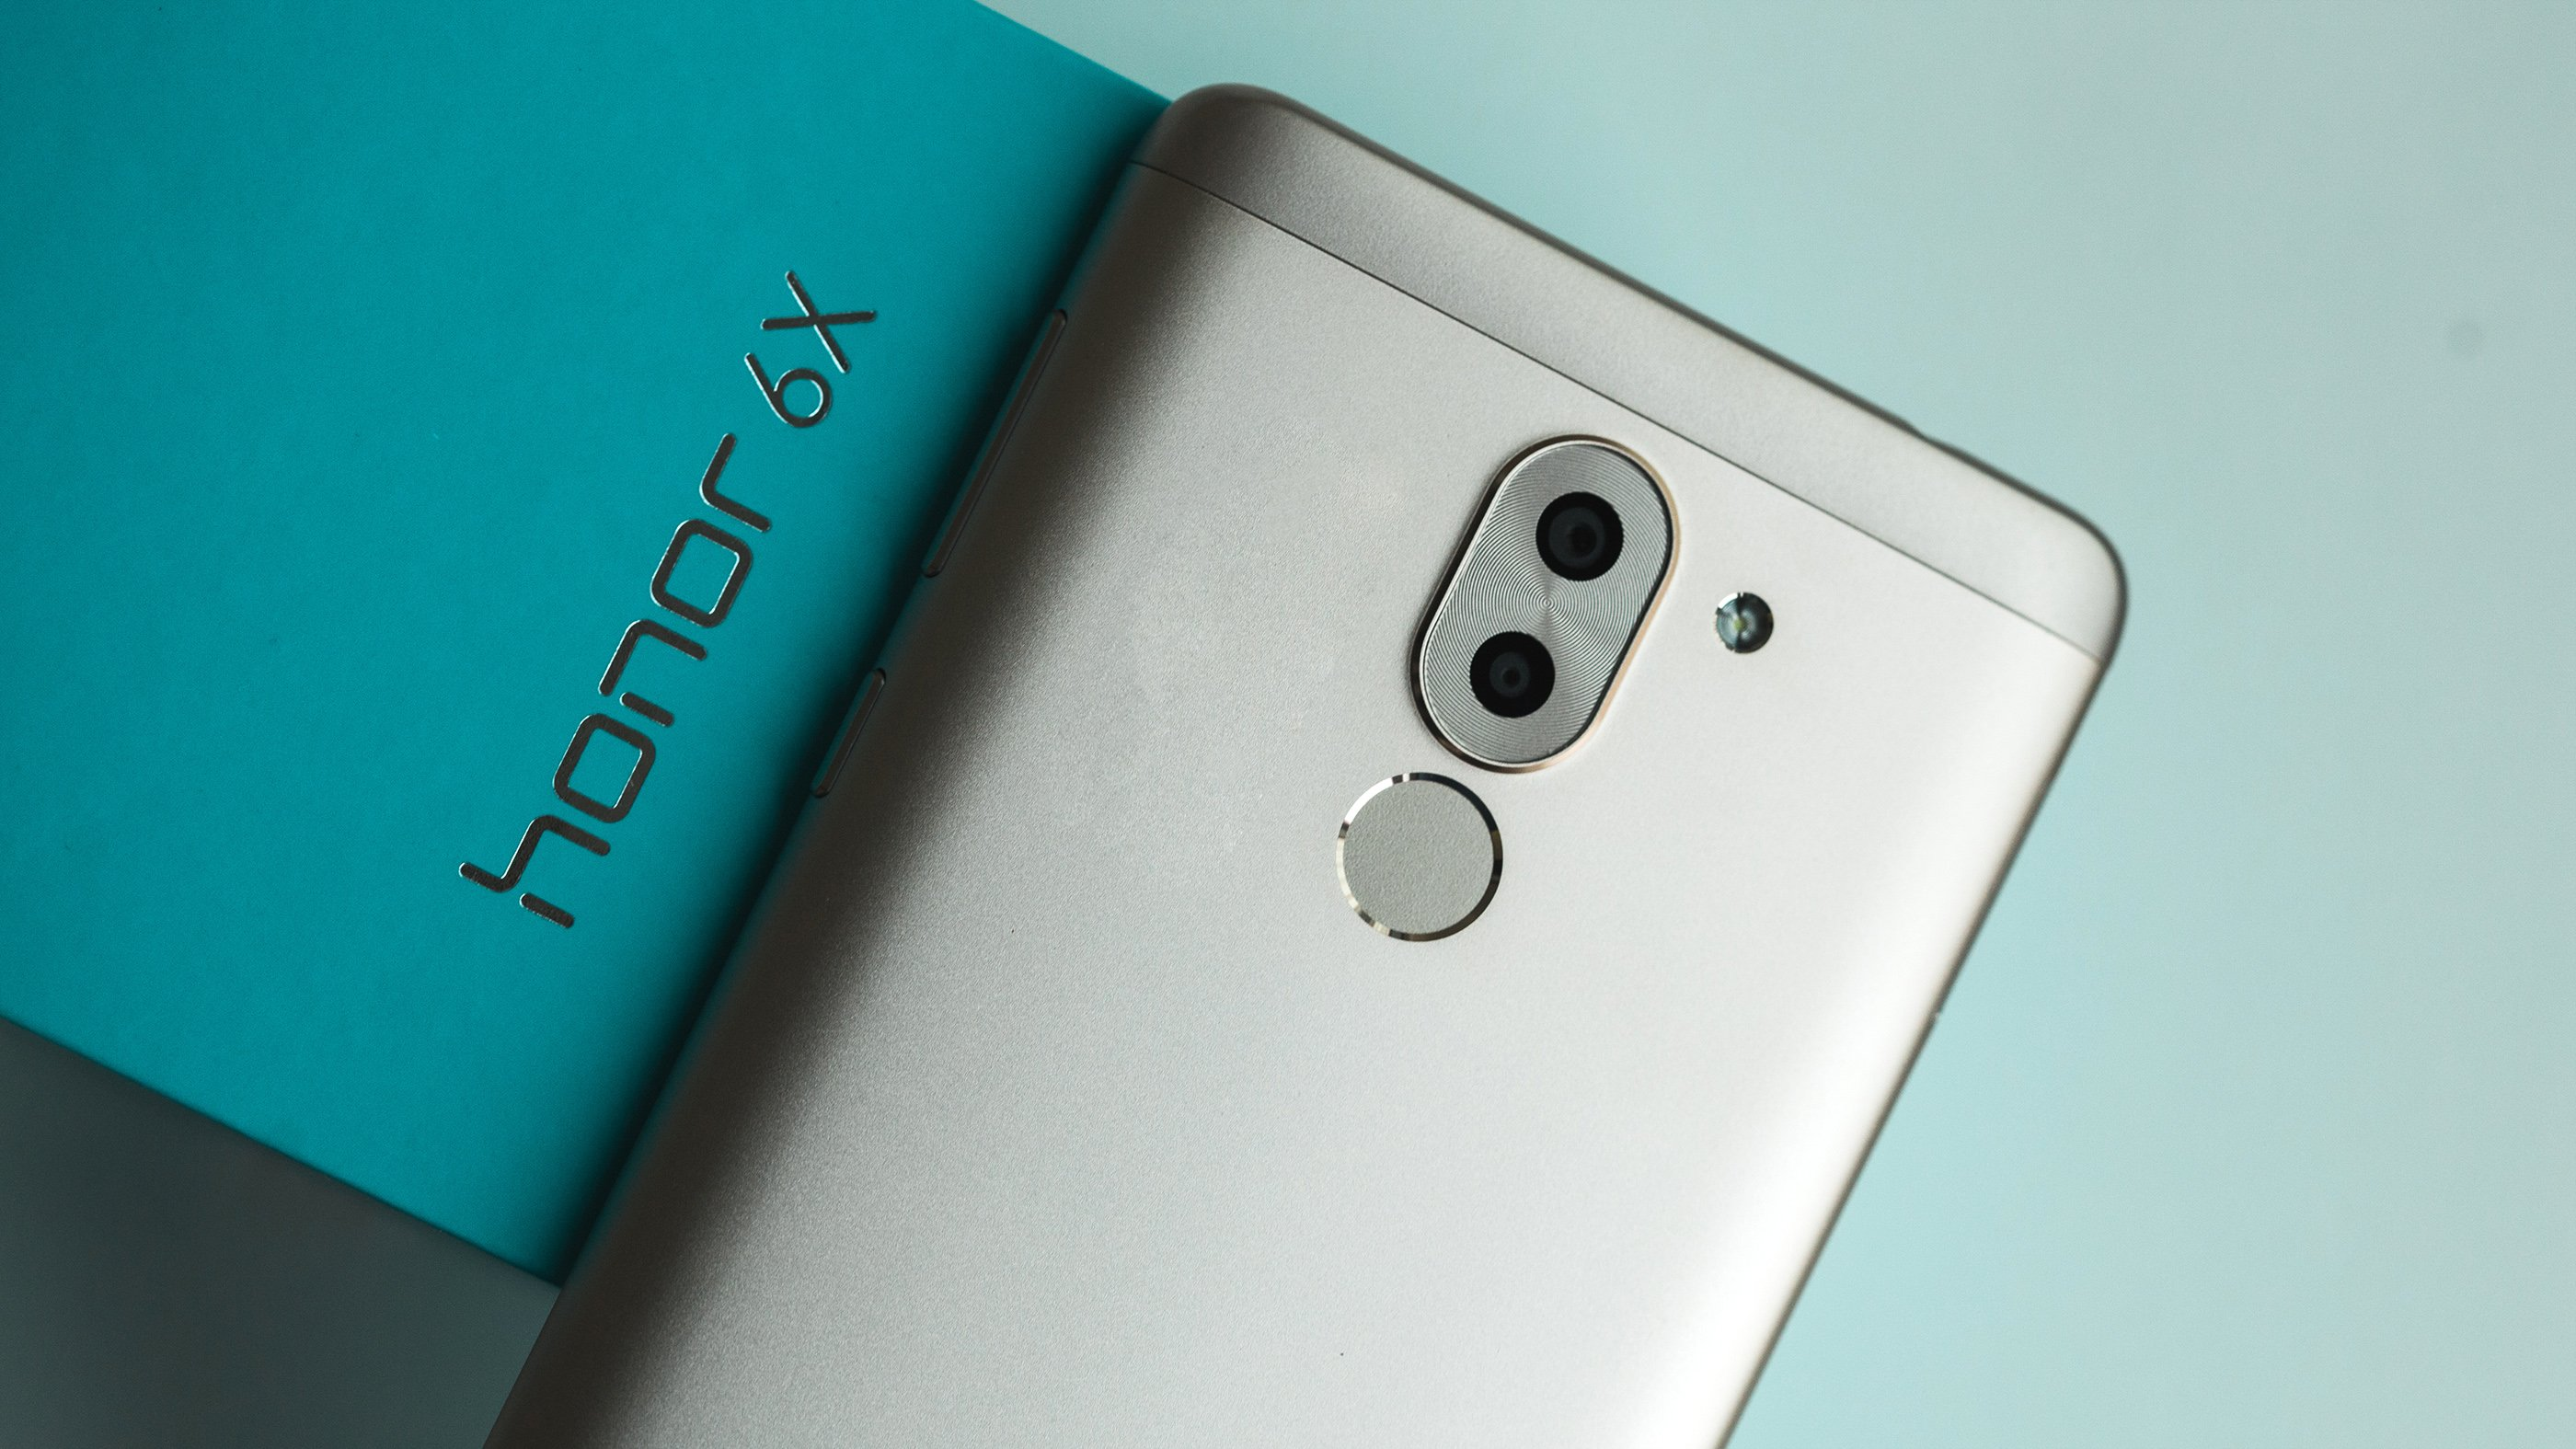 meilleur application android appareil photo